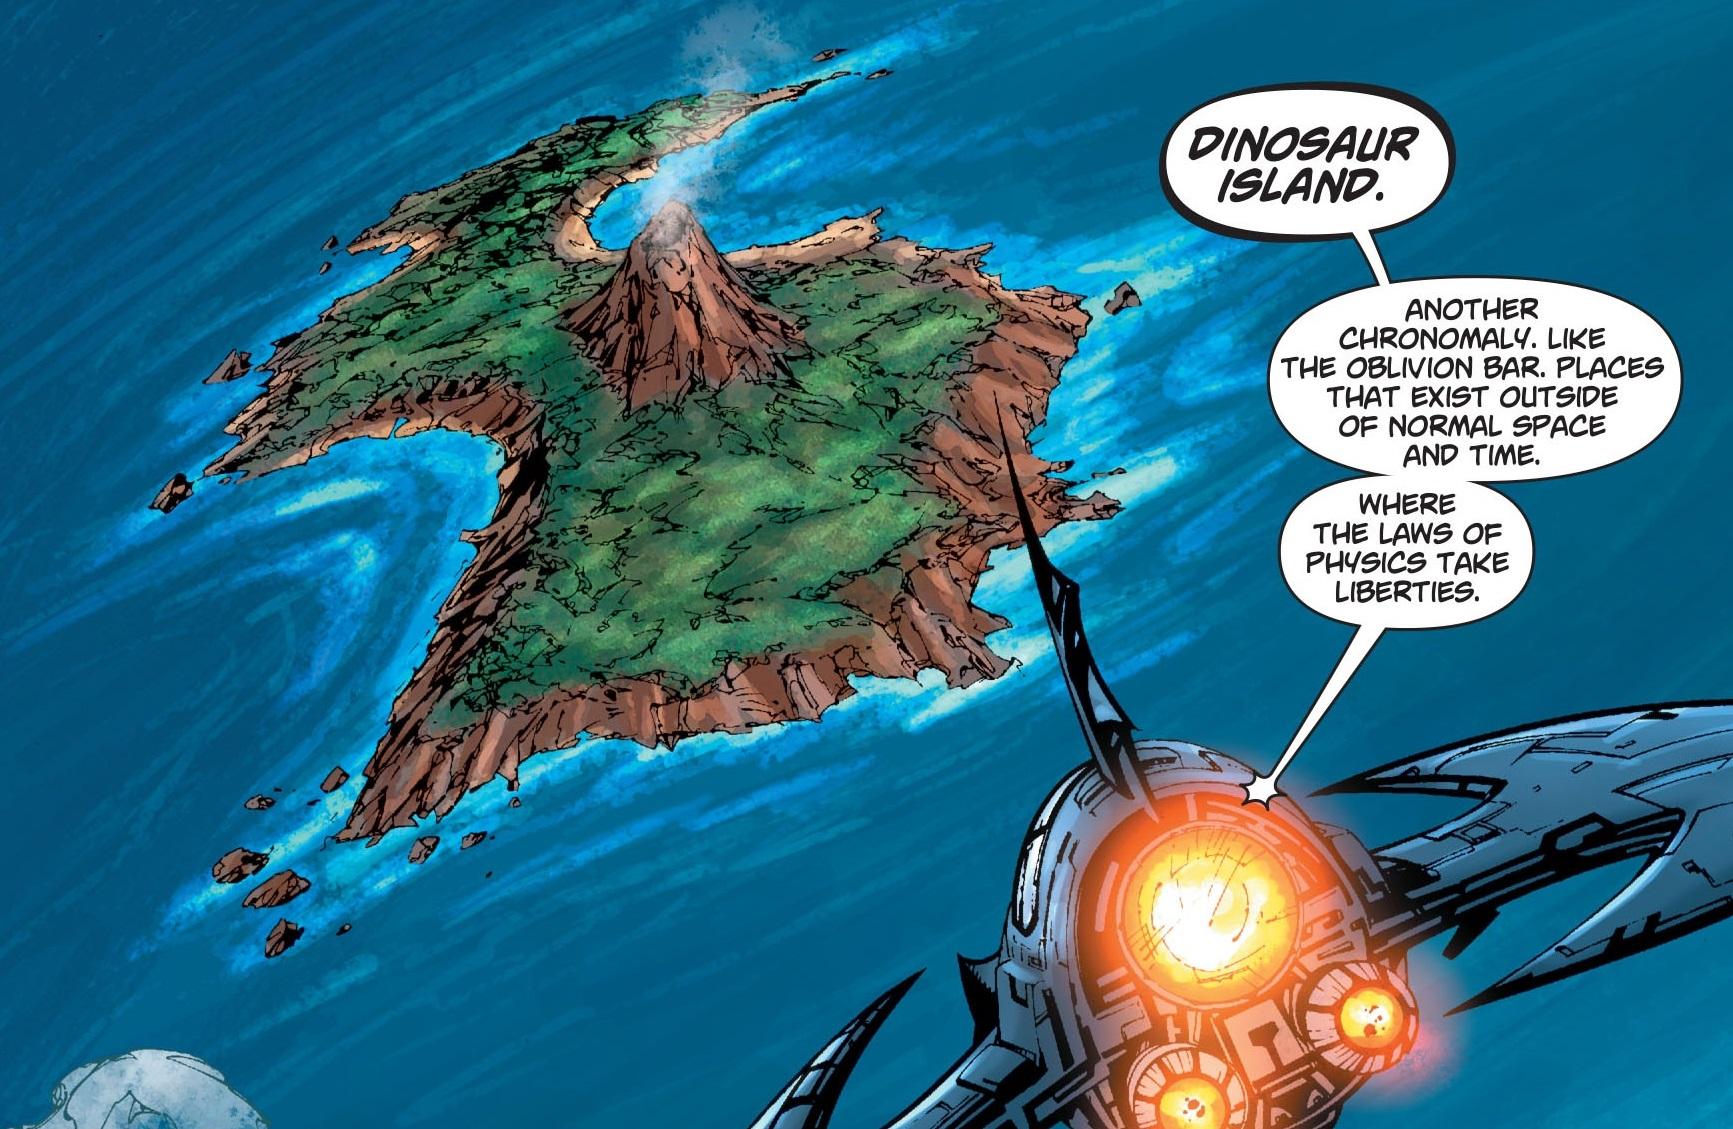 File:Dinosaur Island 02.jpg